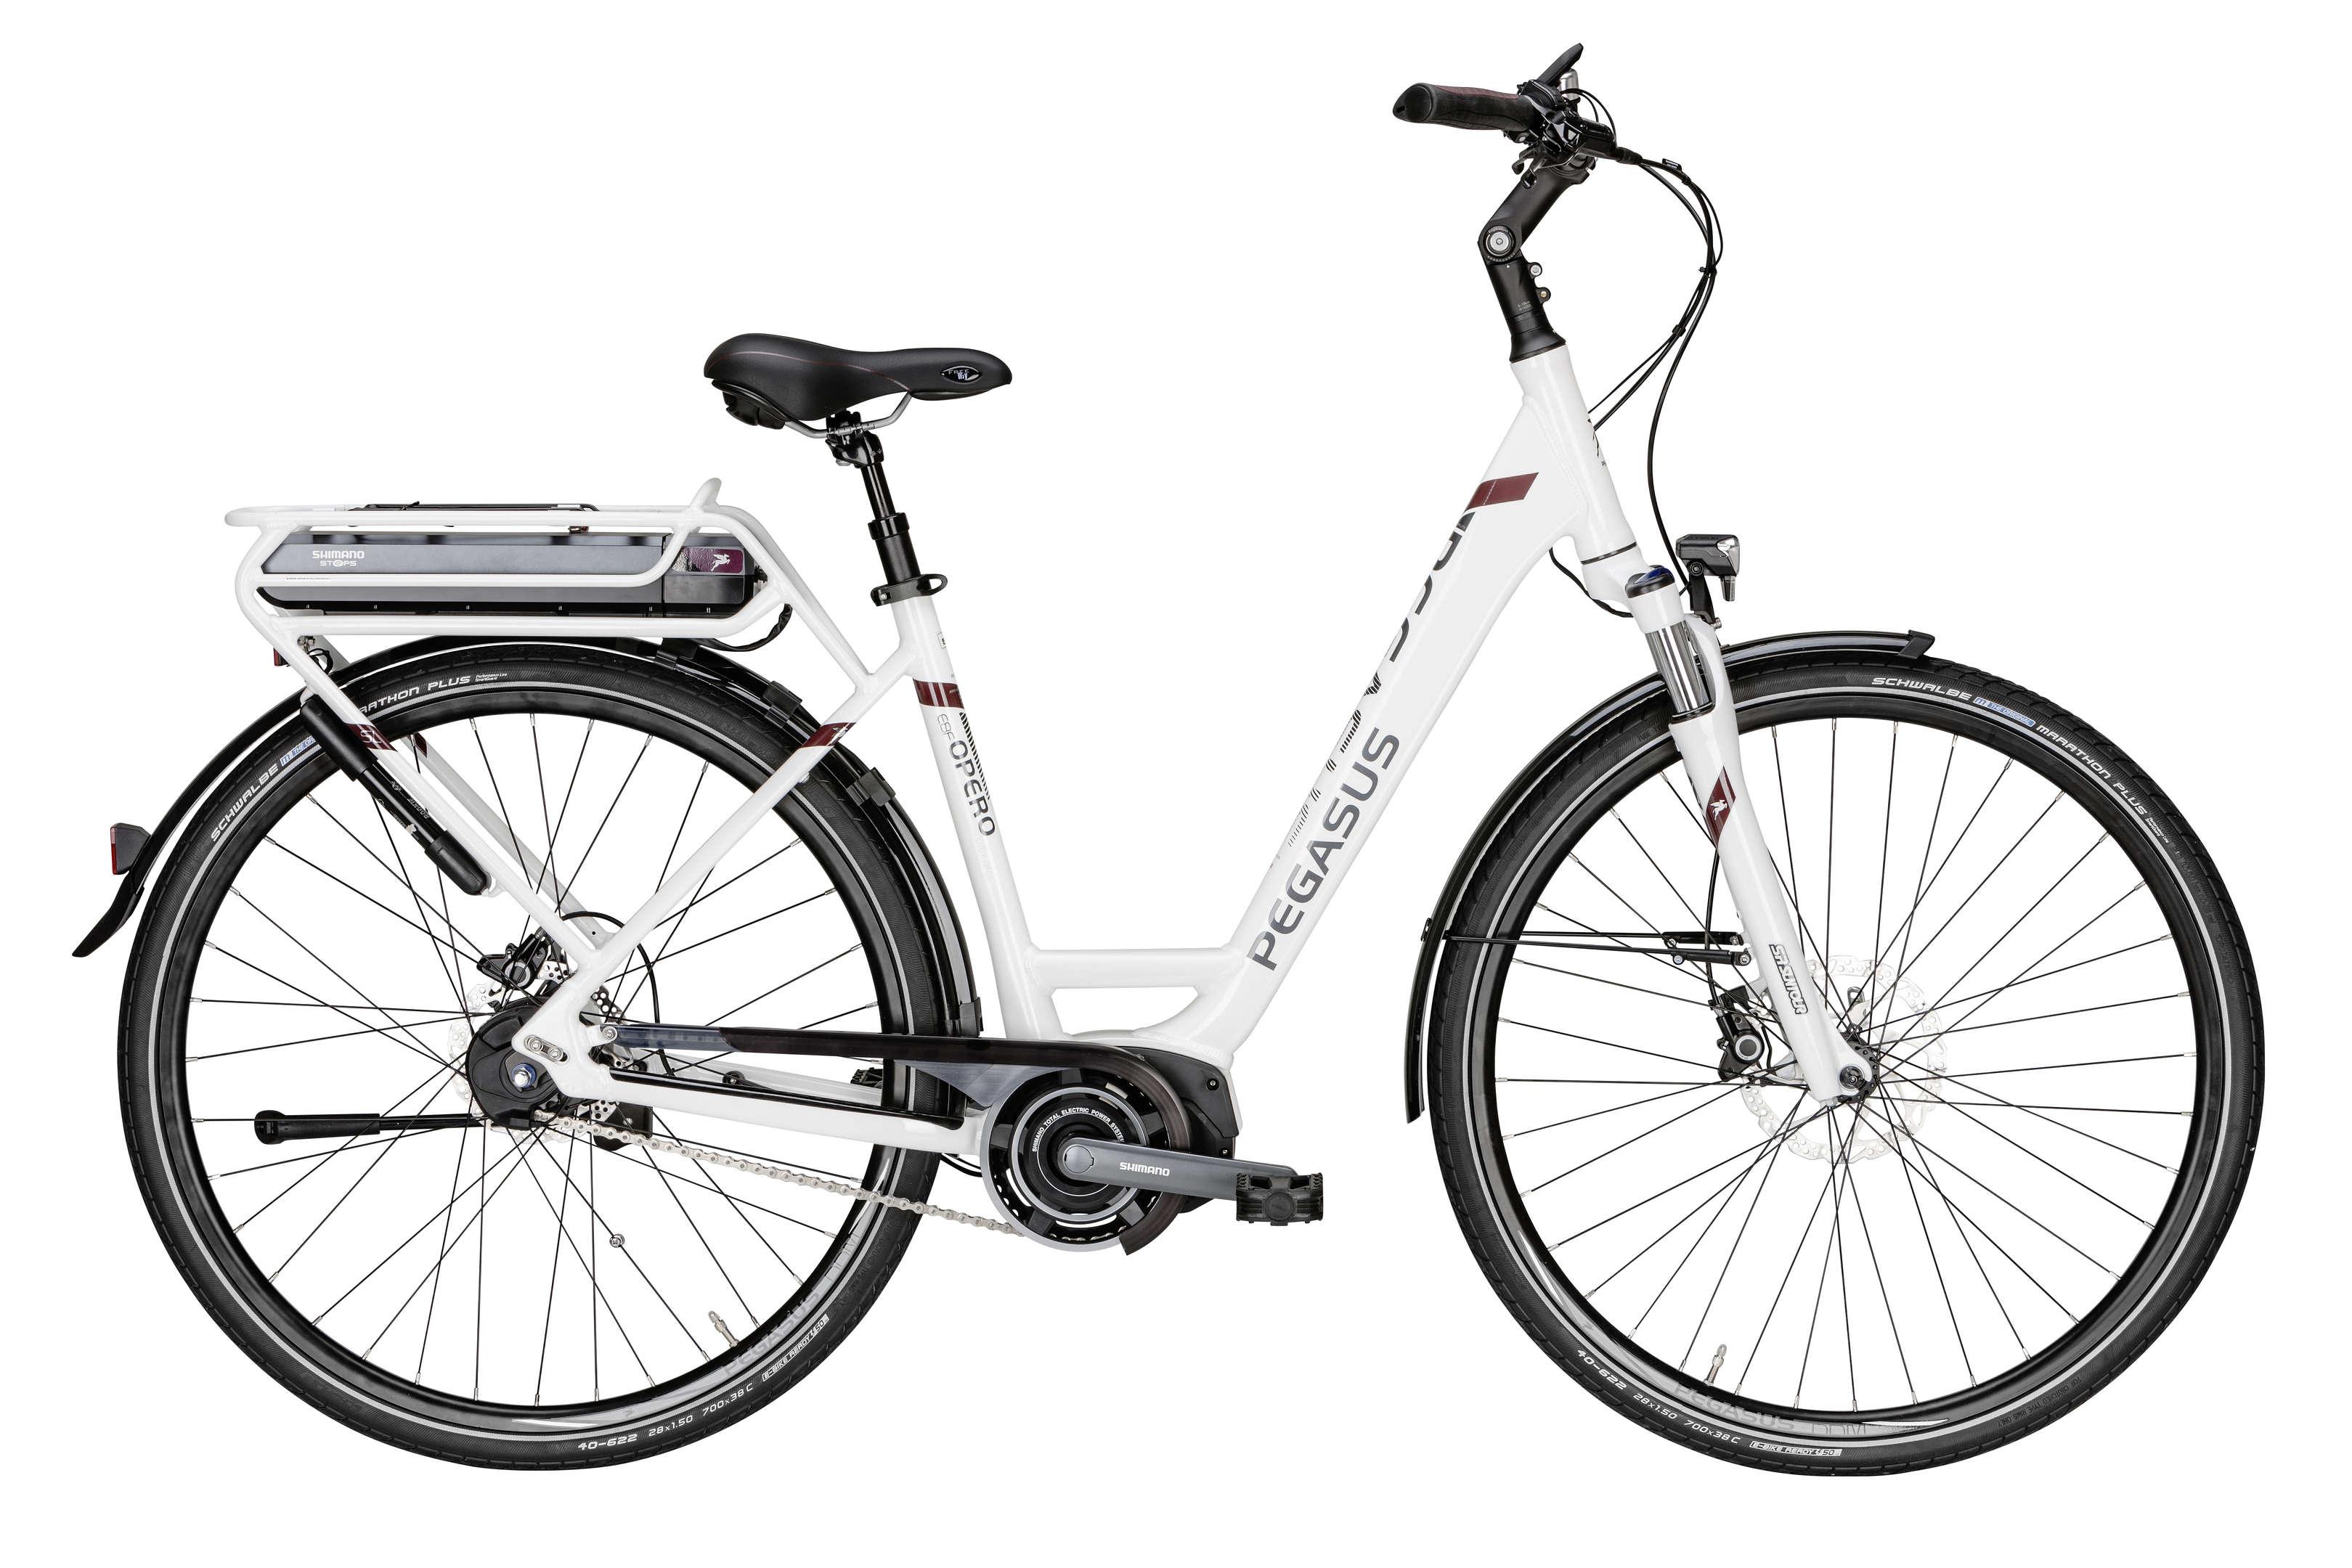 pegasus e bike opero e8f eurorad bikeleasingeurorad. Black Bedroom Furniture Sets. Home Design Ideas